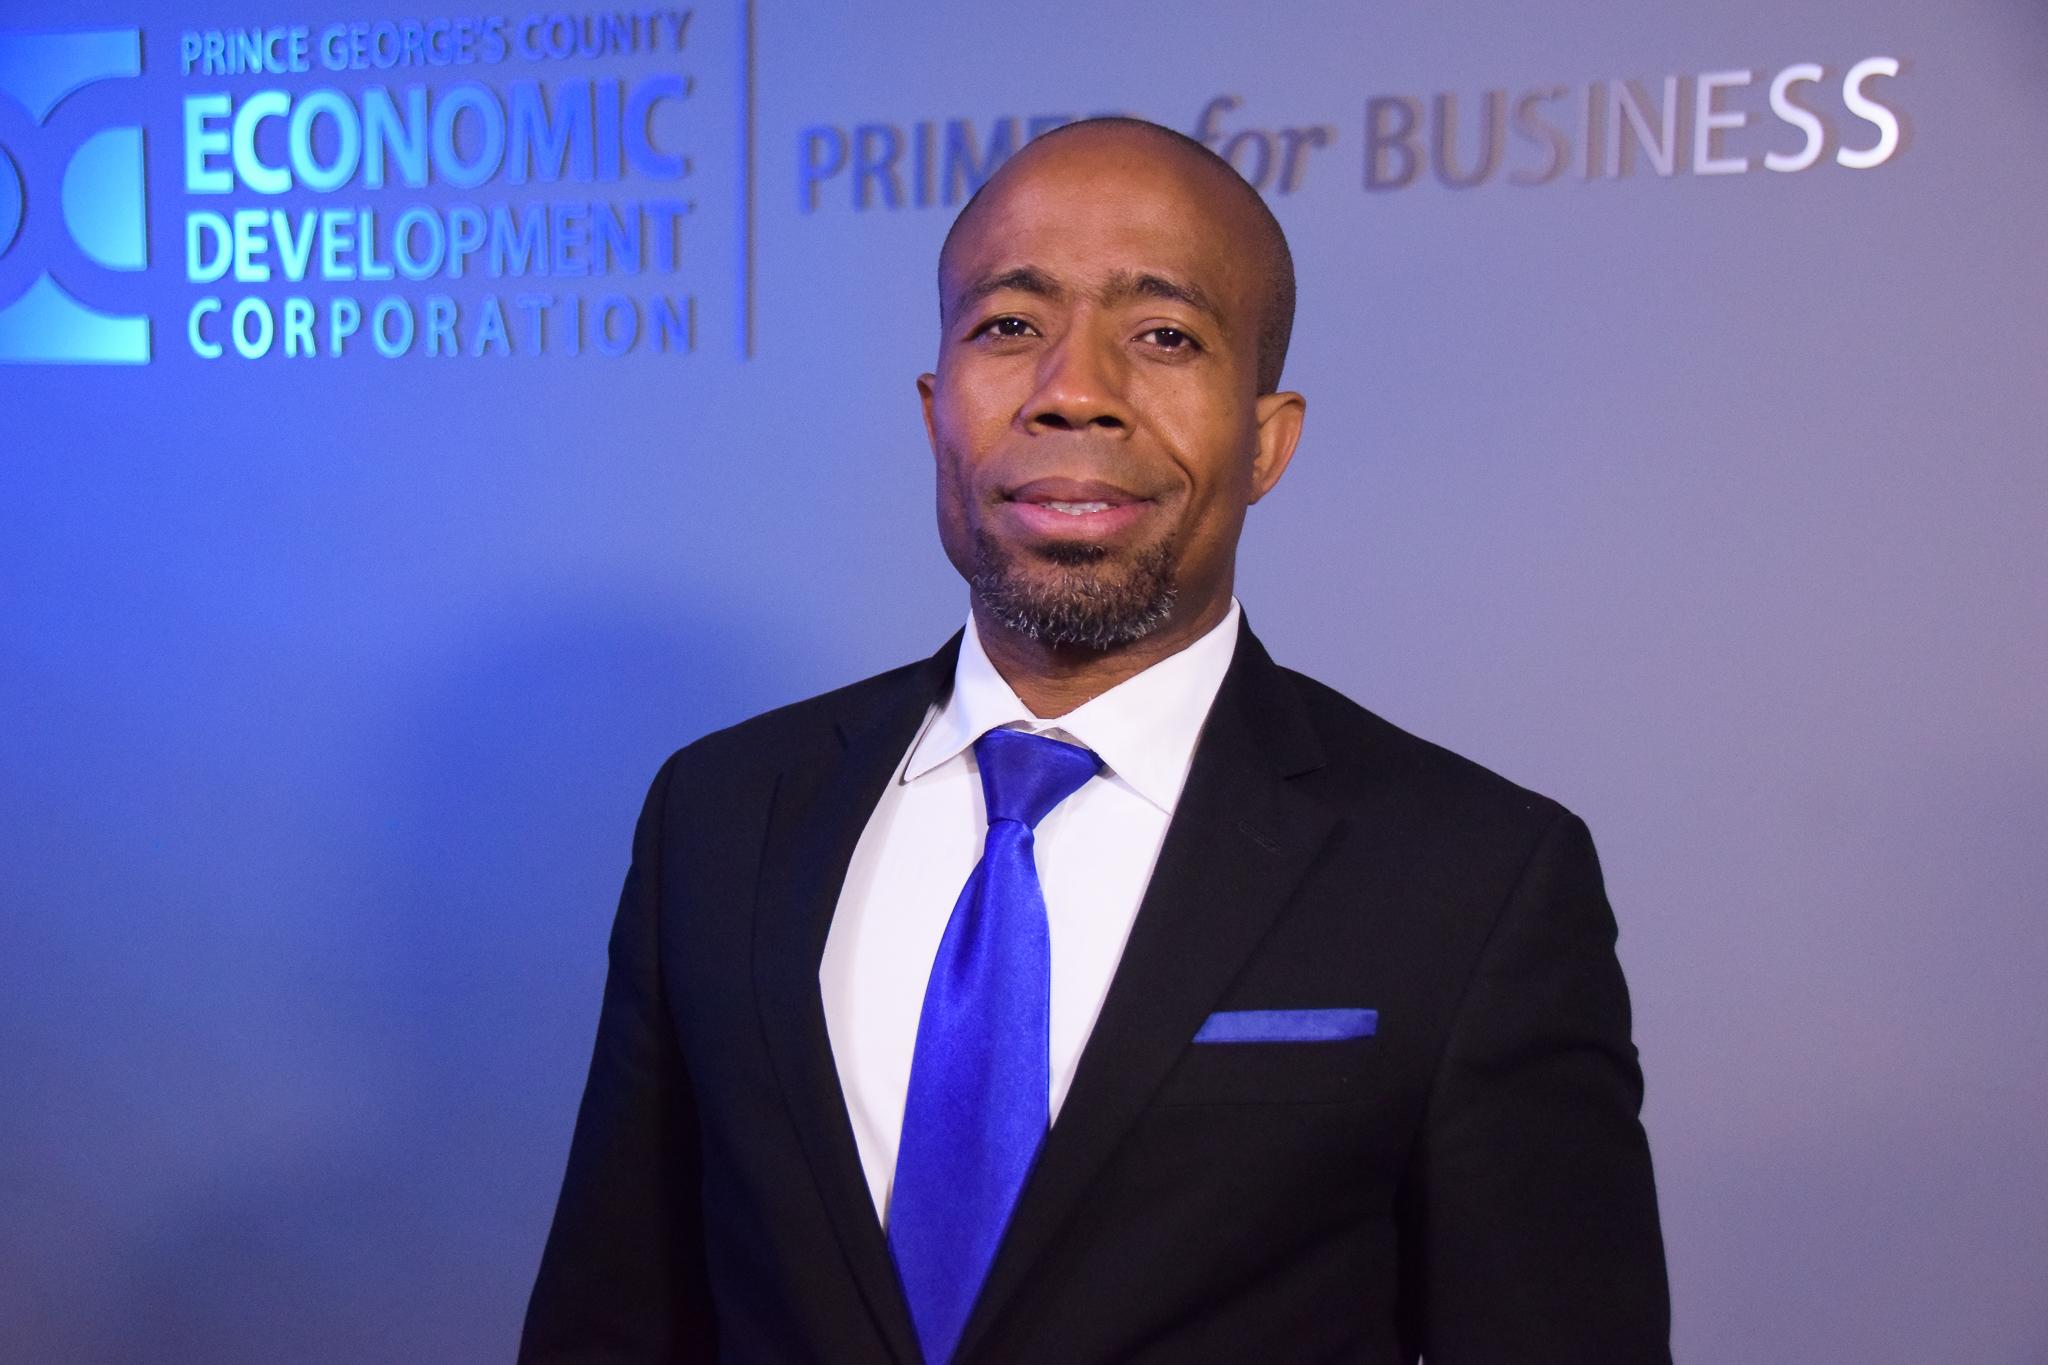 Martin U. Ezemma - Director of International Business301-583-4642